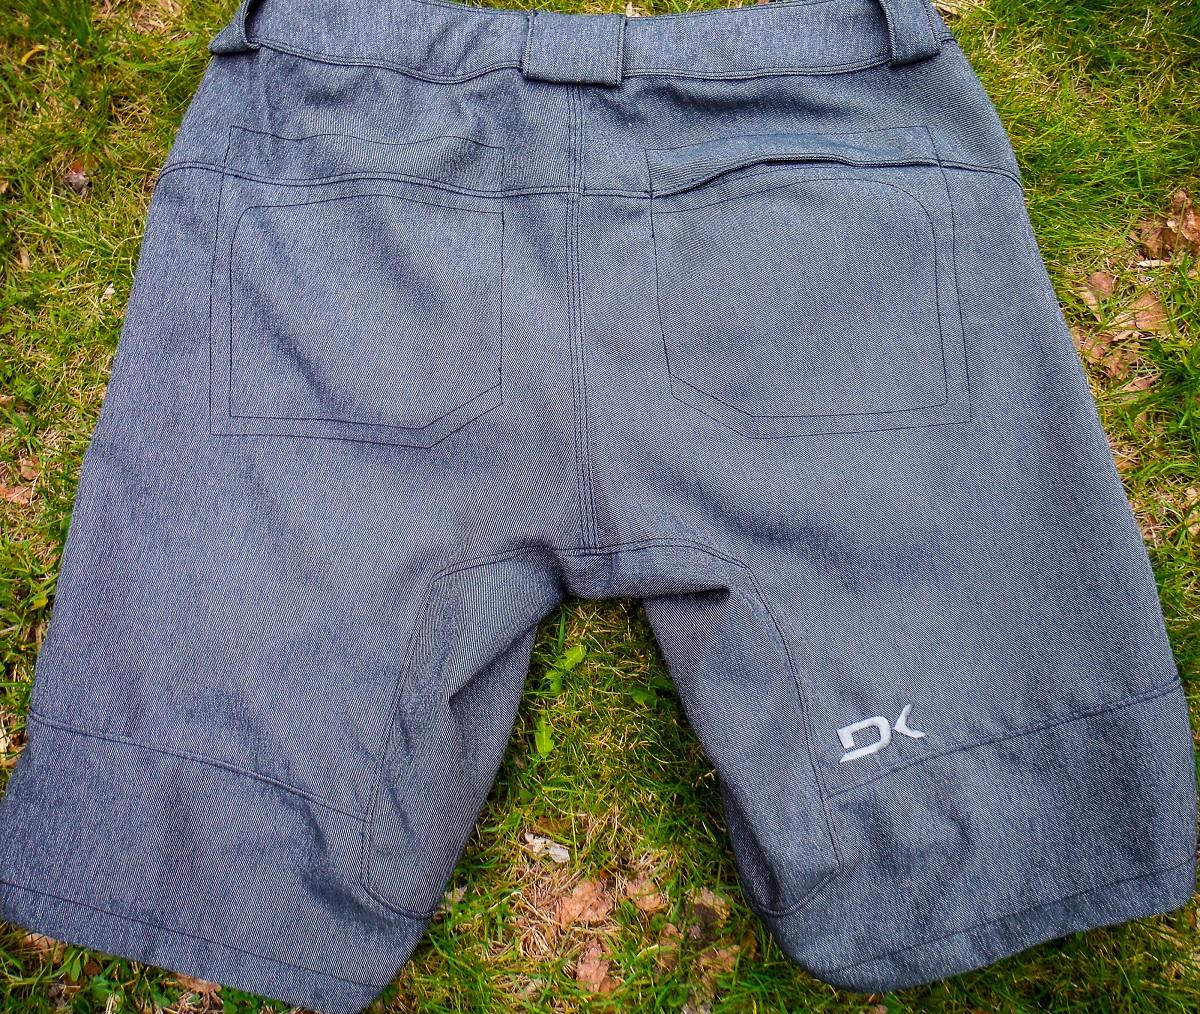 dakine shorts 1200 pic 3 back